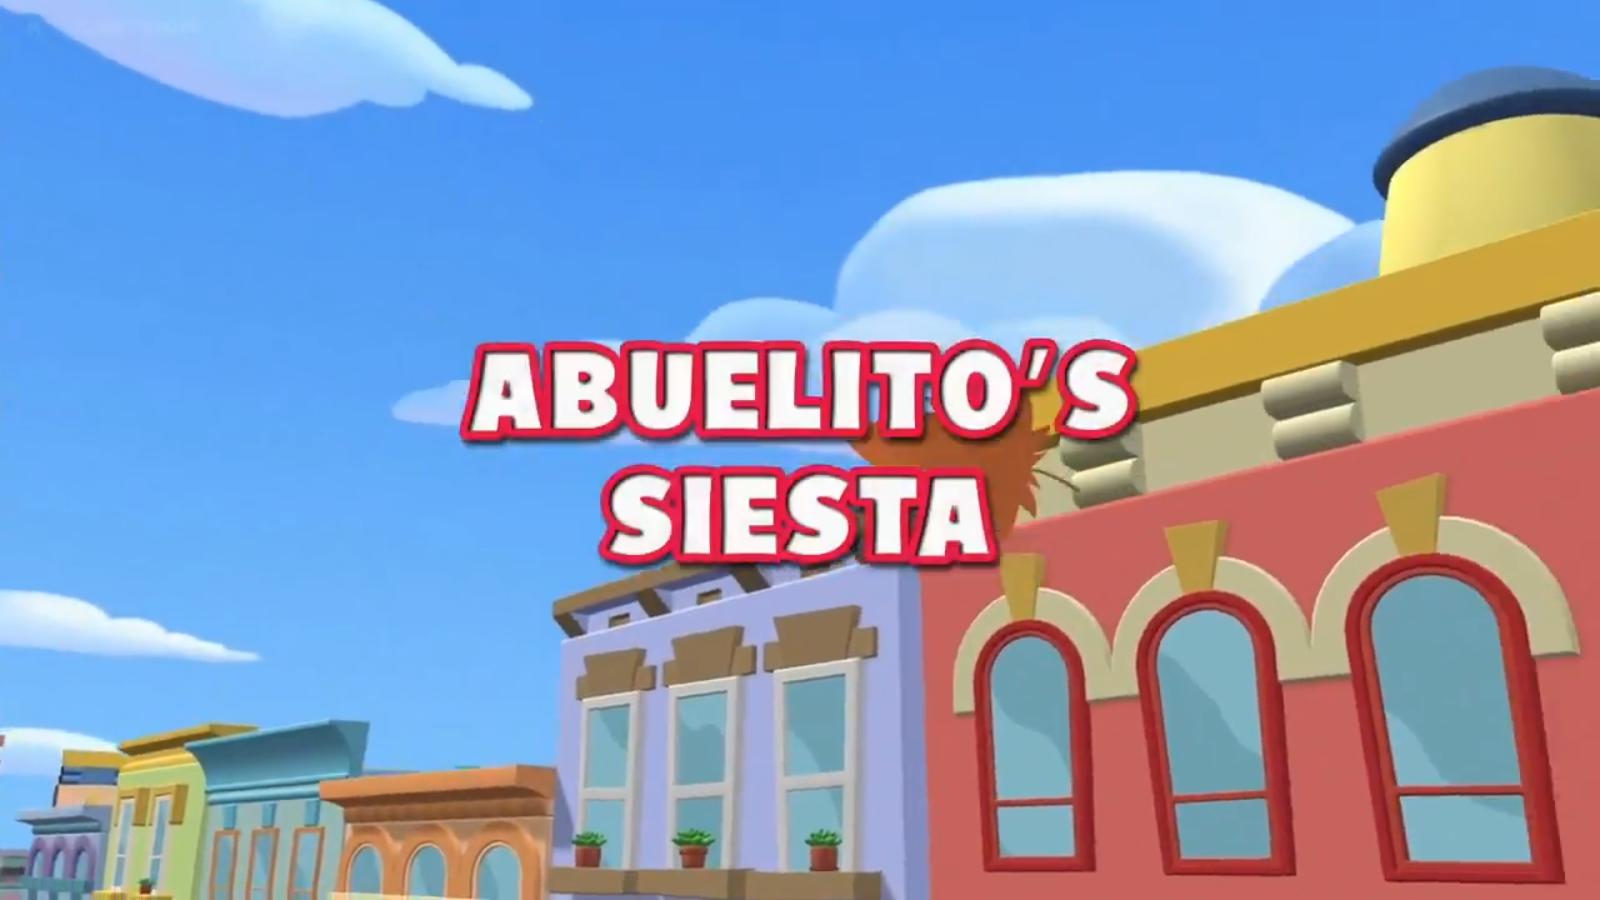 Abuelito's Siesta